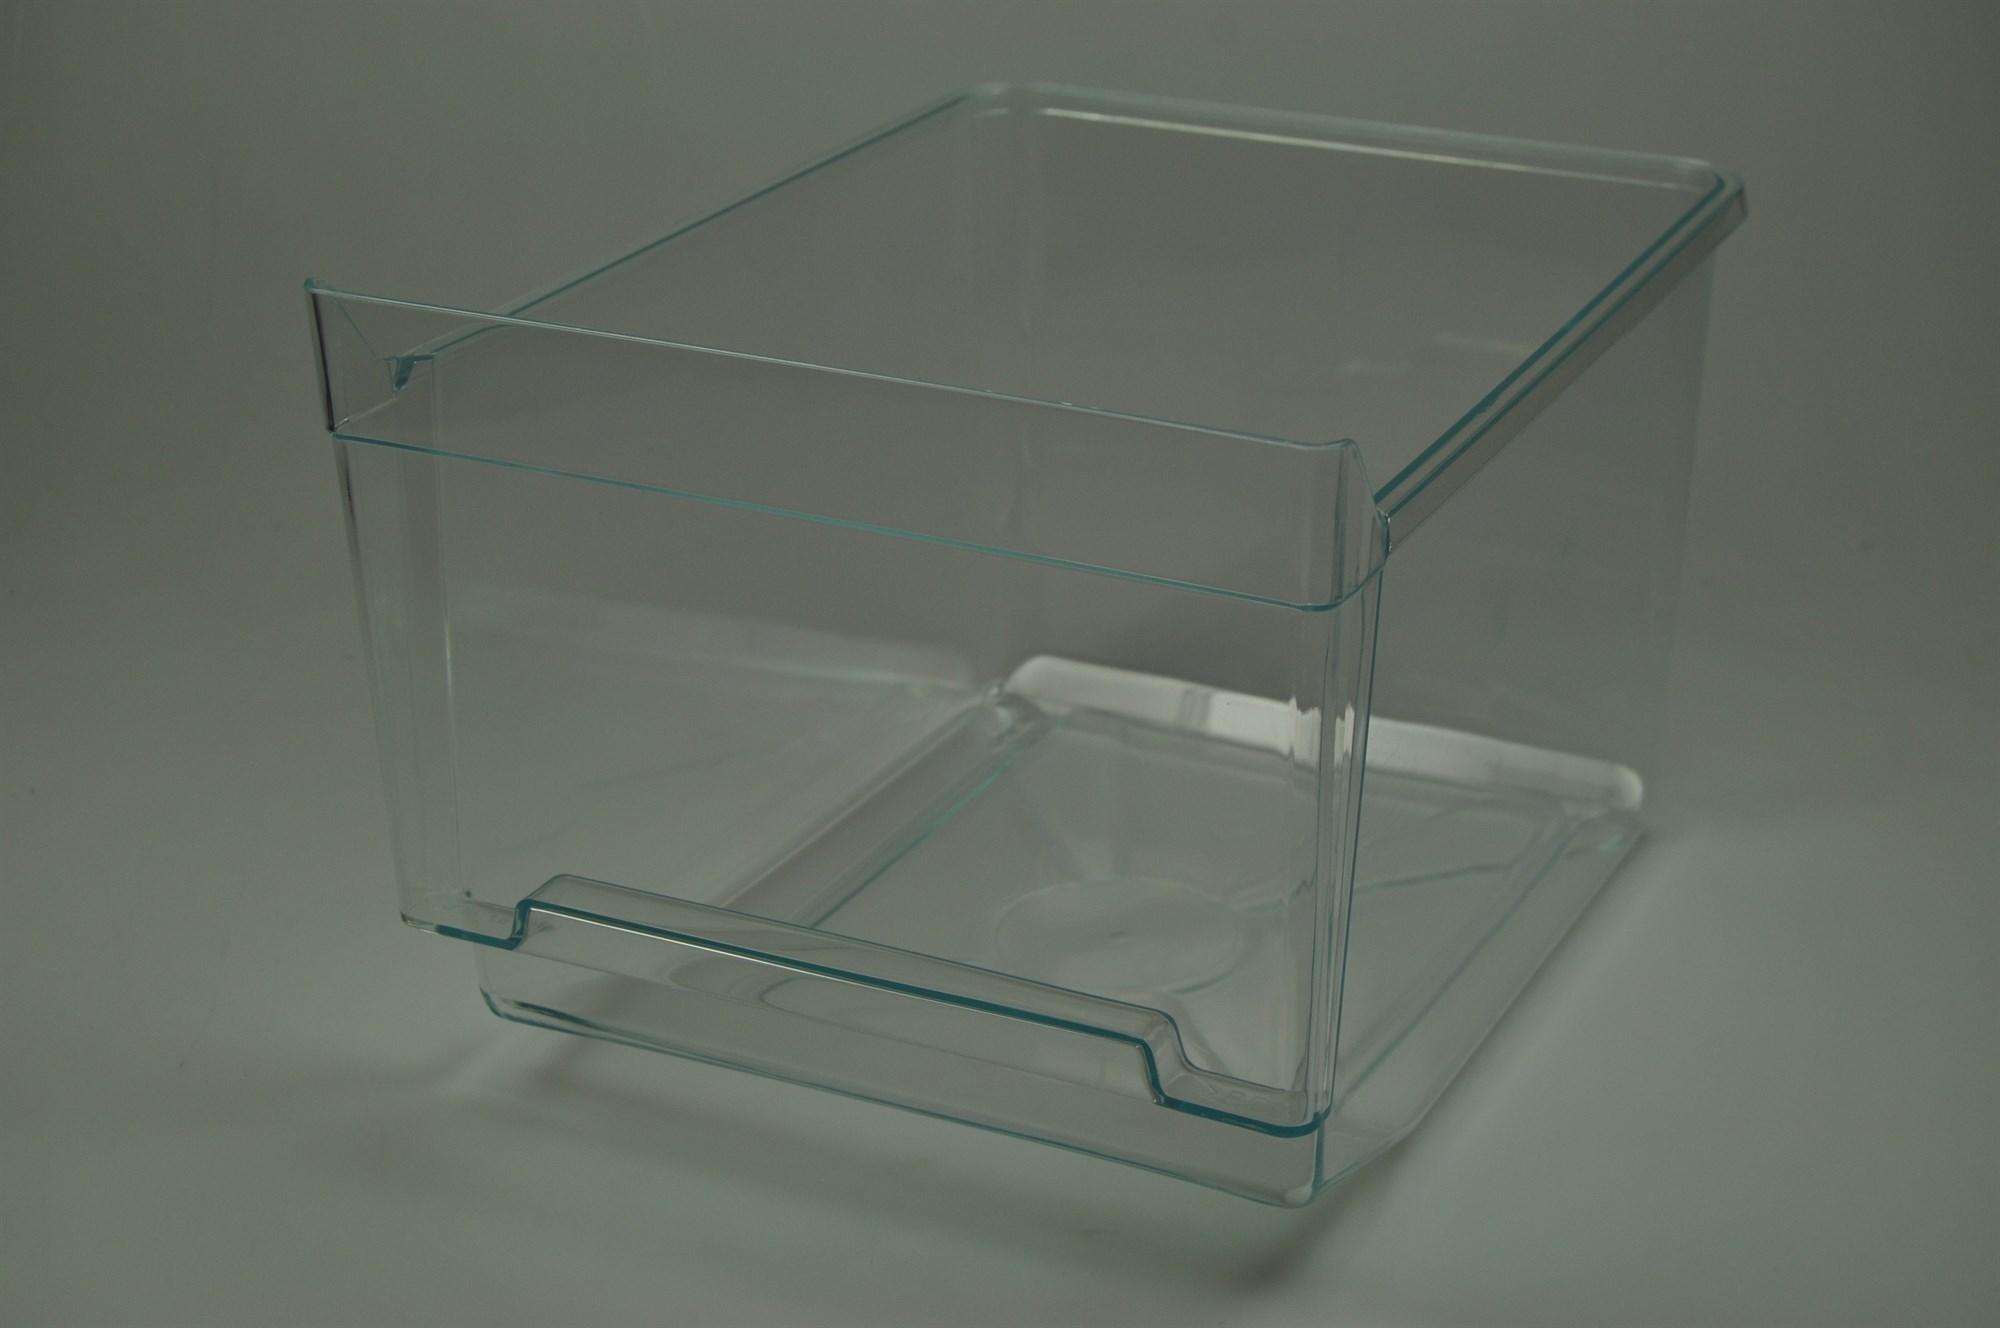 bac l gume miele frigo cong lateur 200mm x 225mm x 295mm. Black Bedroom Furniture Sets. Home Design Ideas